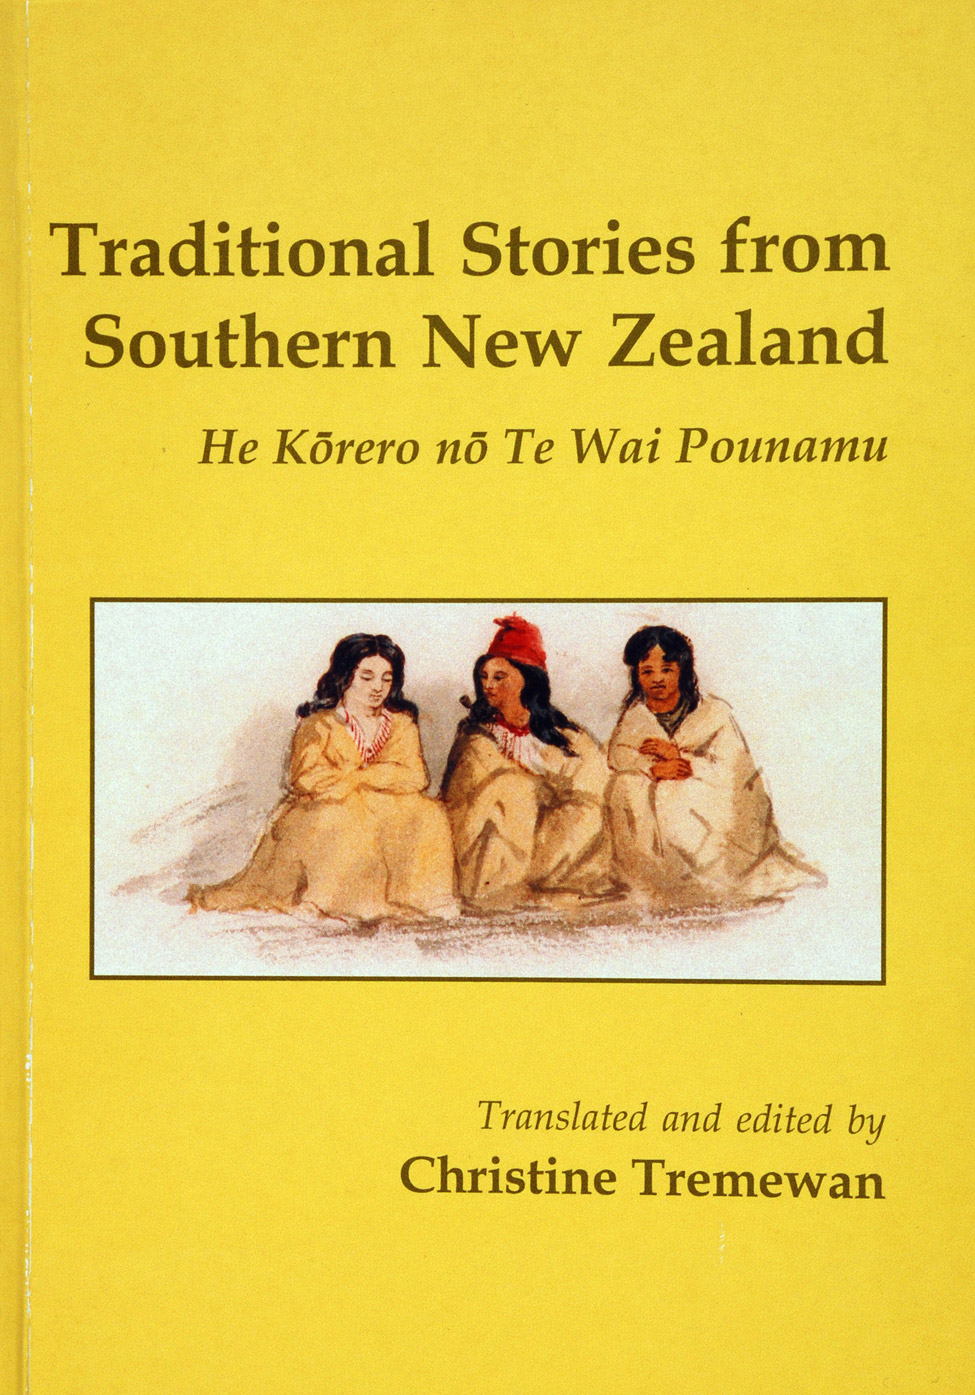 Christine Tremewan (trans. and ed.). <i>Traditional Stories from Southern New Zealand: He Kōrero nō Te Wai Pounamu. </i> Christchurch: Macmillan Brown Centre for Pacific Studies, University of Canterbury, 2002.